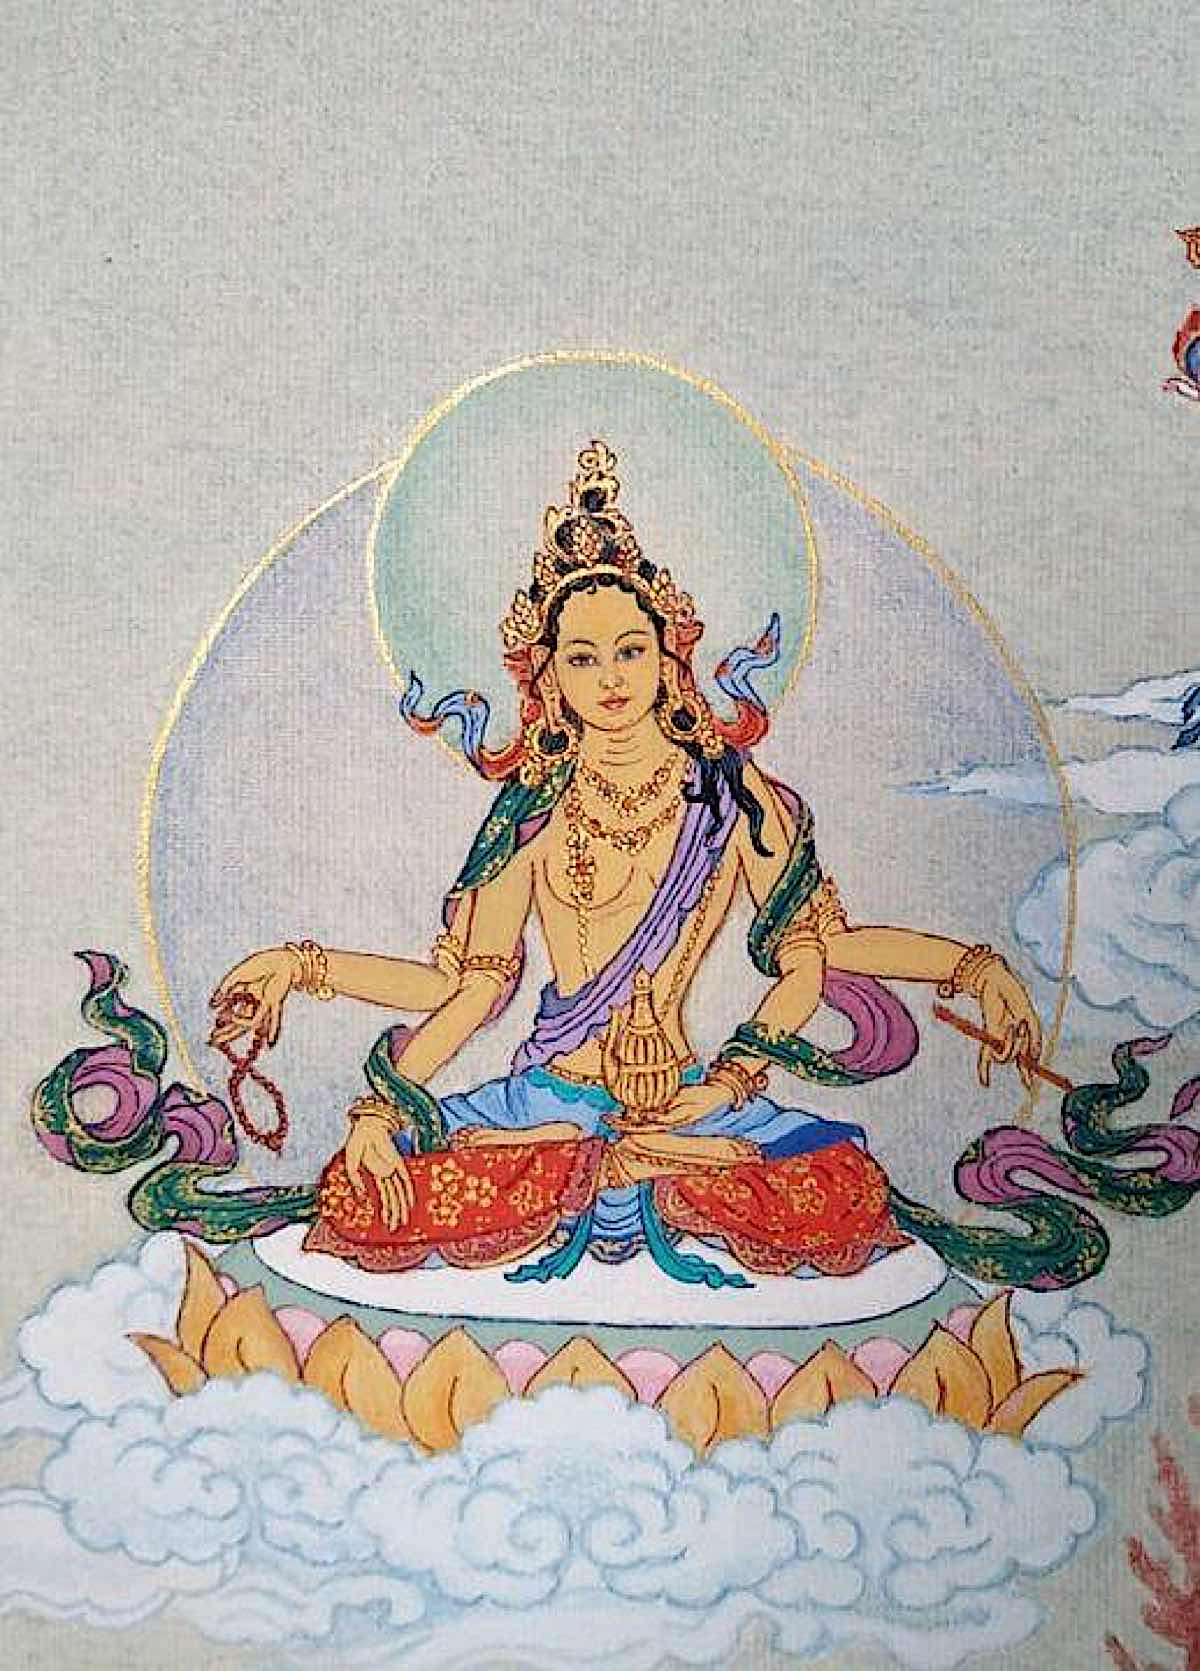 Buddha Weekly 4 Tara the Victorious Usnisa of Tathagatas Usnisa Vijaya Tara 21 Taras Thankha by Angeli Lhadripa Shkonda Buddhism